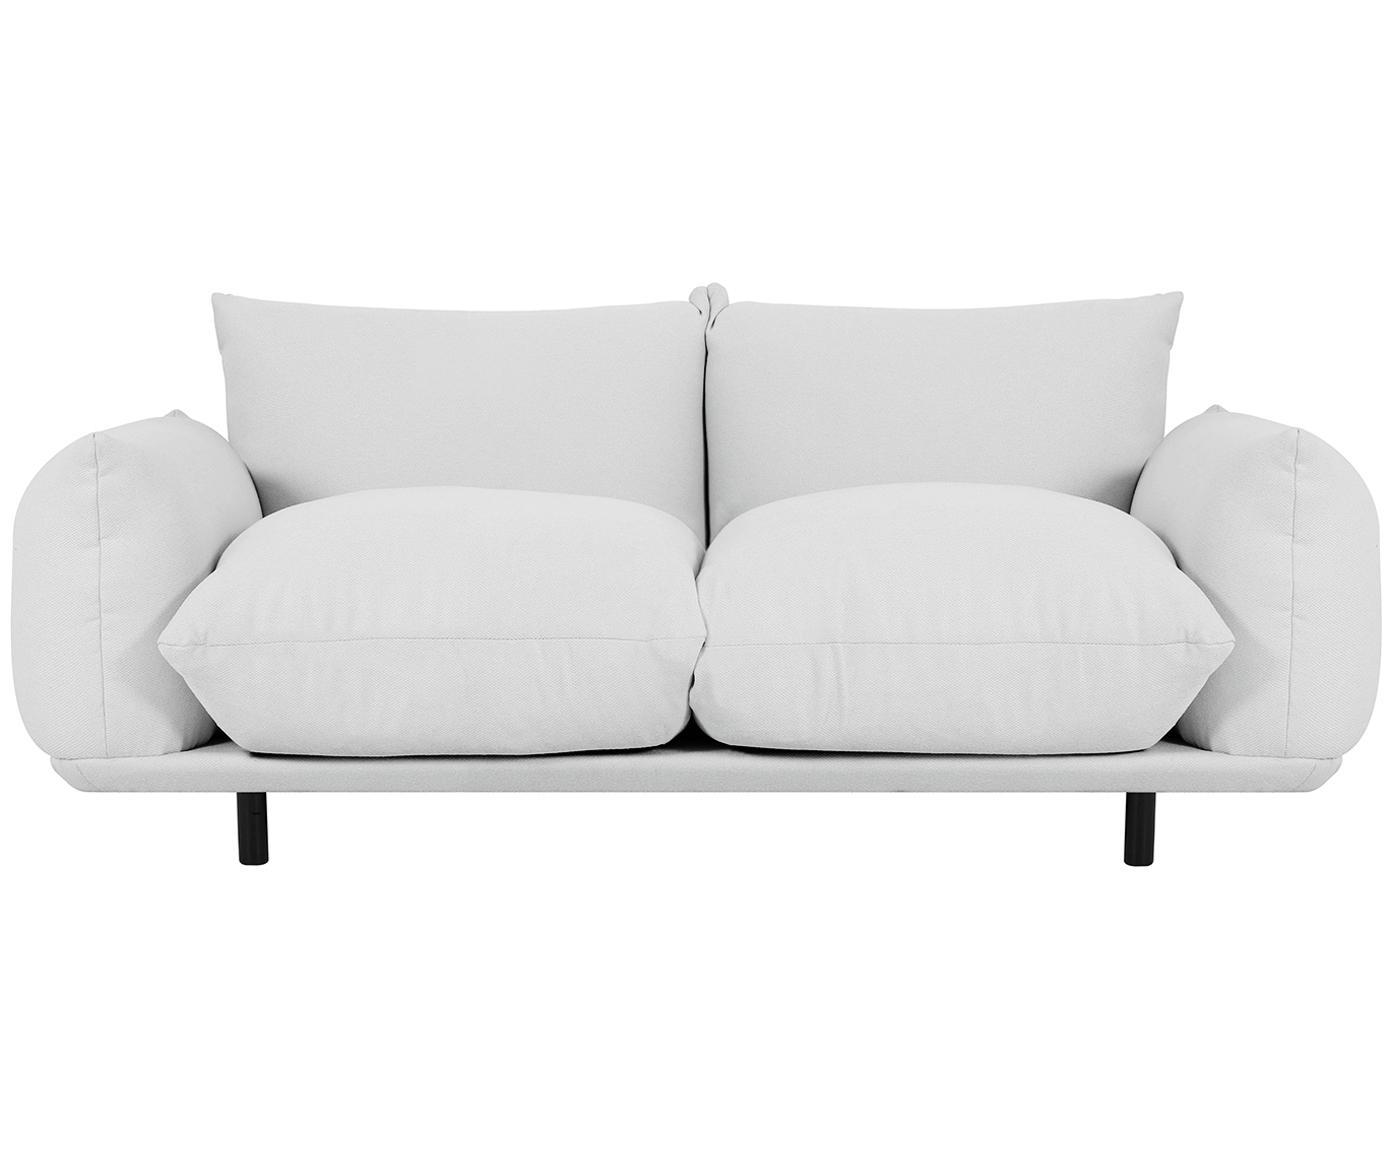 Sofa Saga (2-Sitzer), Bezug: 100% Polyester 35.000 Sch, Gestell: Massives Birkenholz, Füße: Metall, pulverbeschichtet, Webstoff Hellgrau, B 170 x T 103 cm